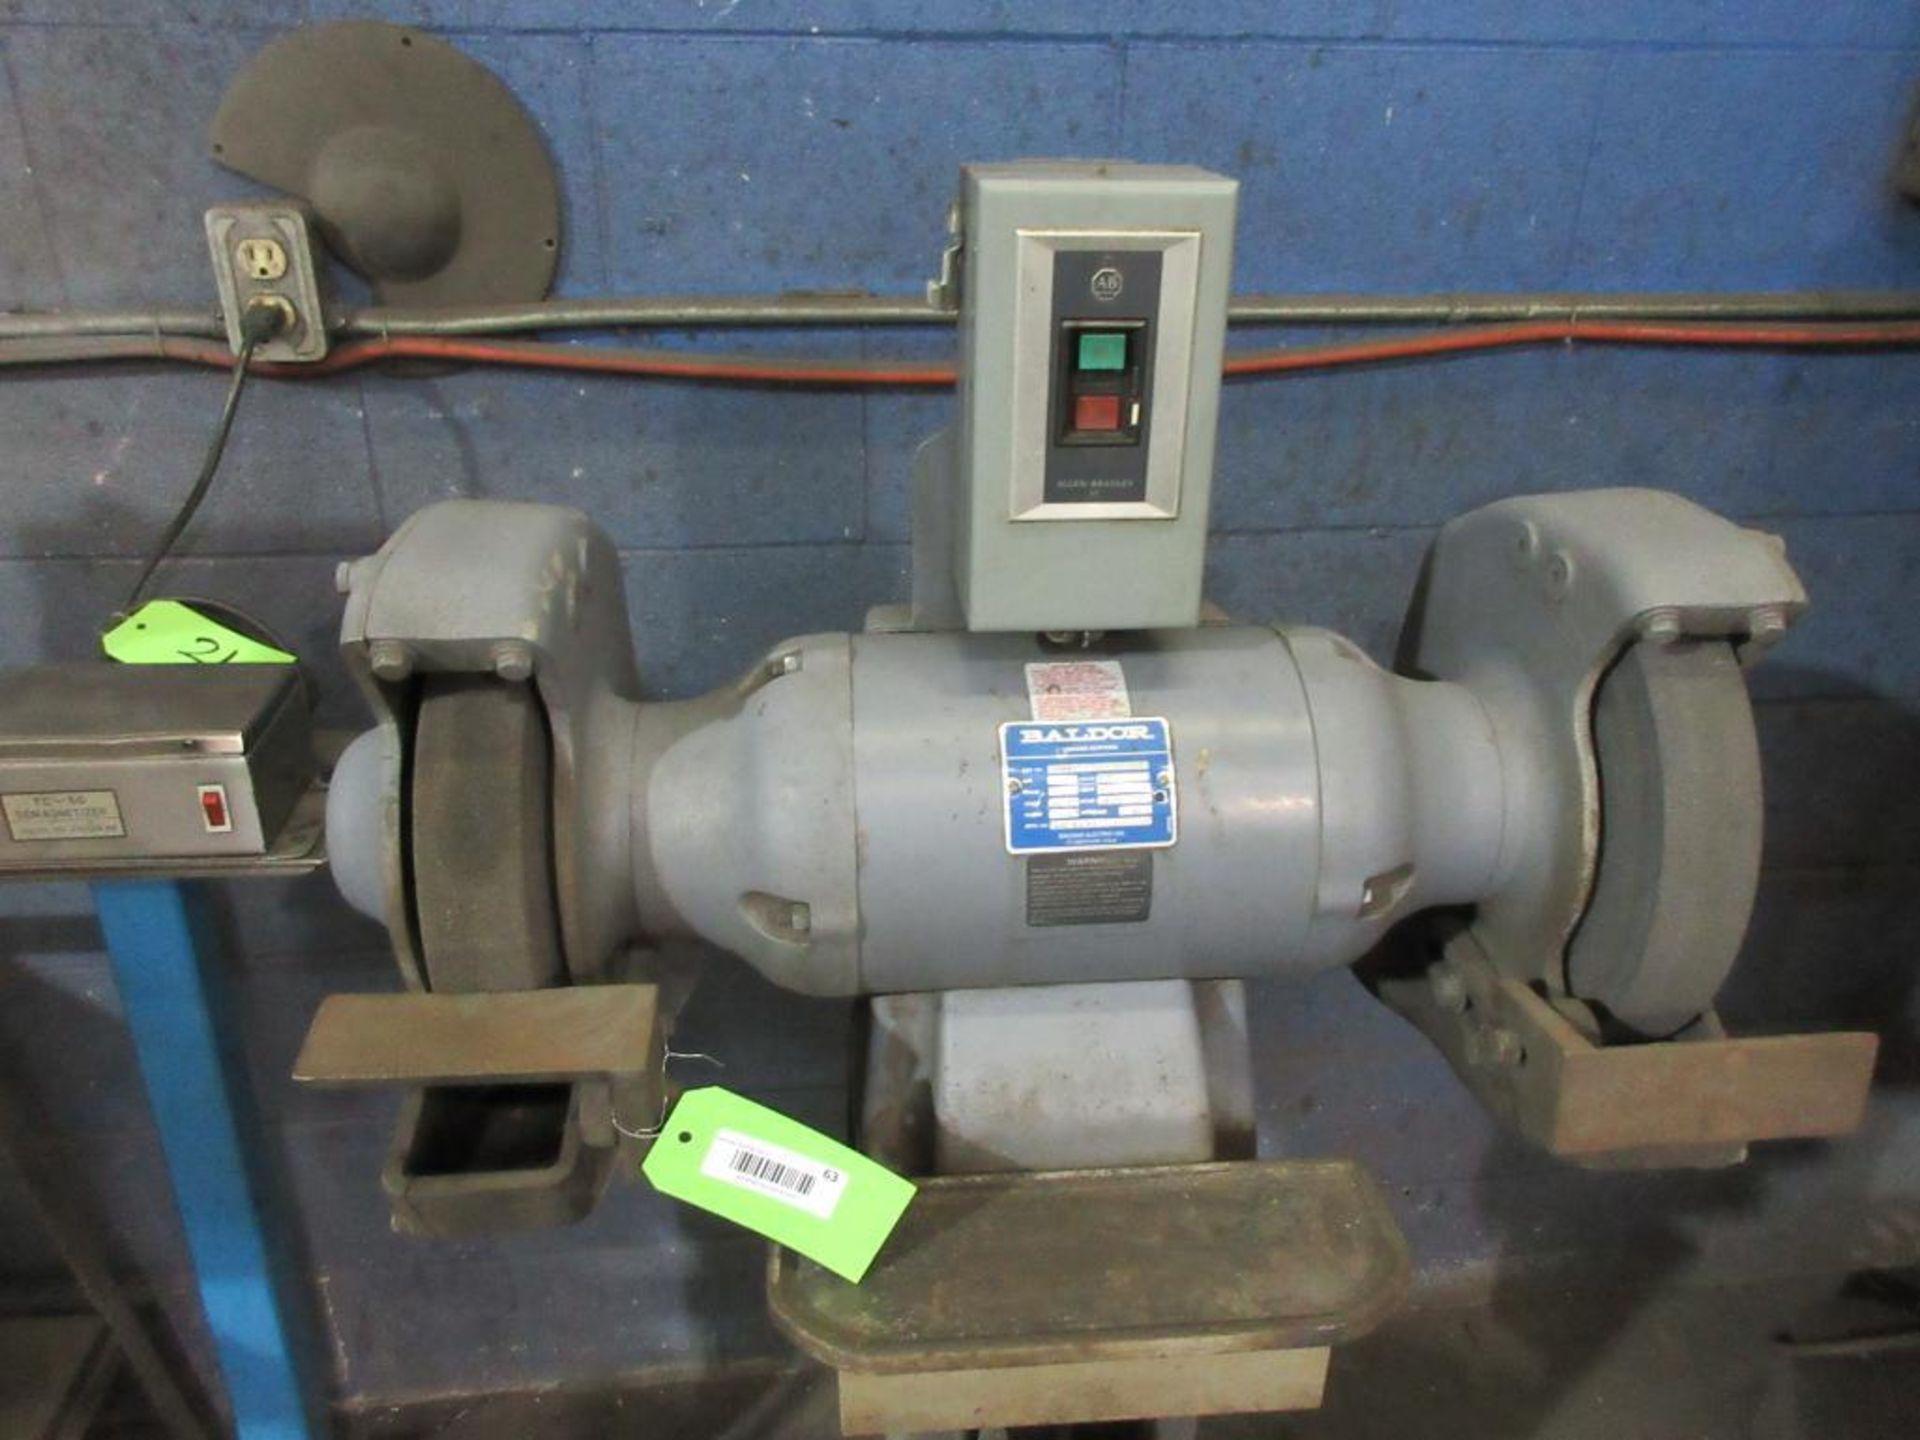 BALDOR DUAL PEDESTAL GRINDER 3 HP, SPARE GRINDING WHEEL - Image 2 of 4